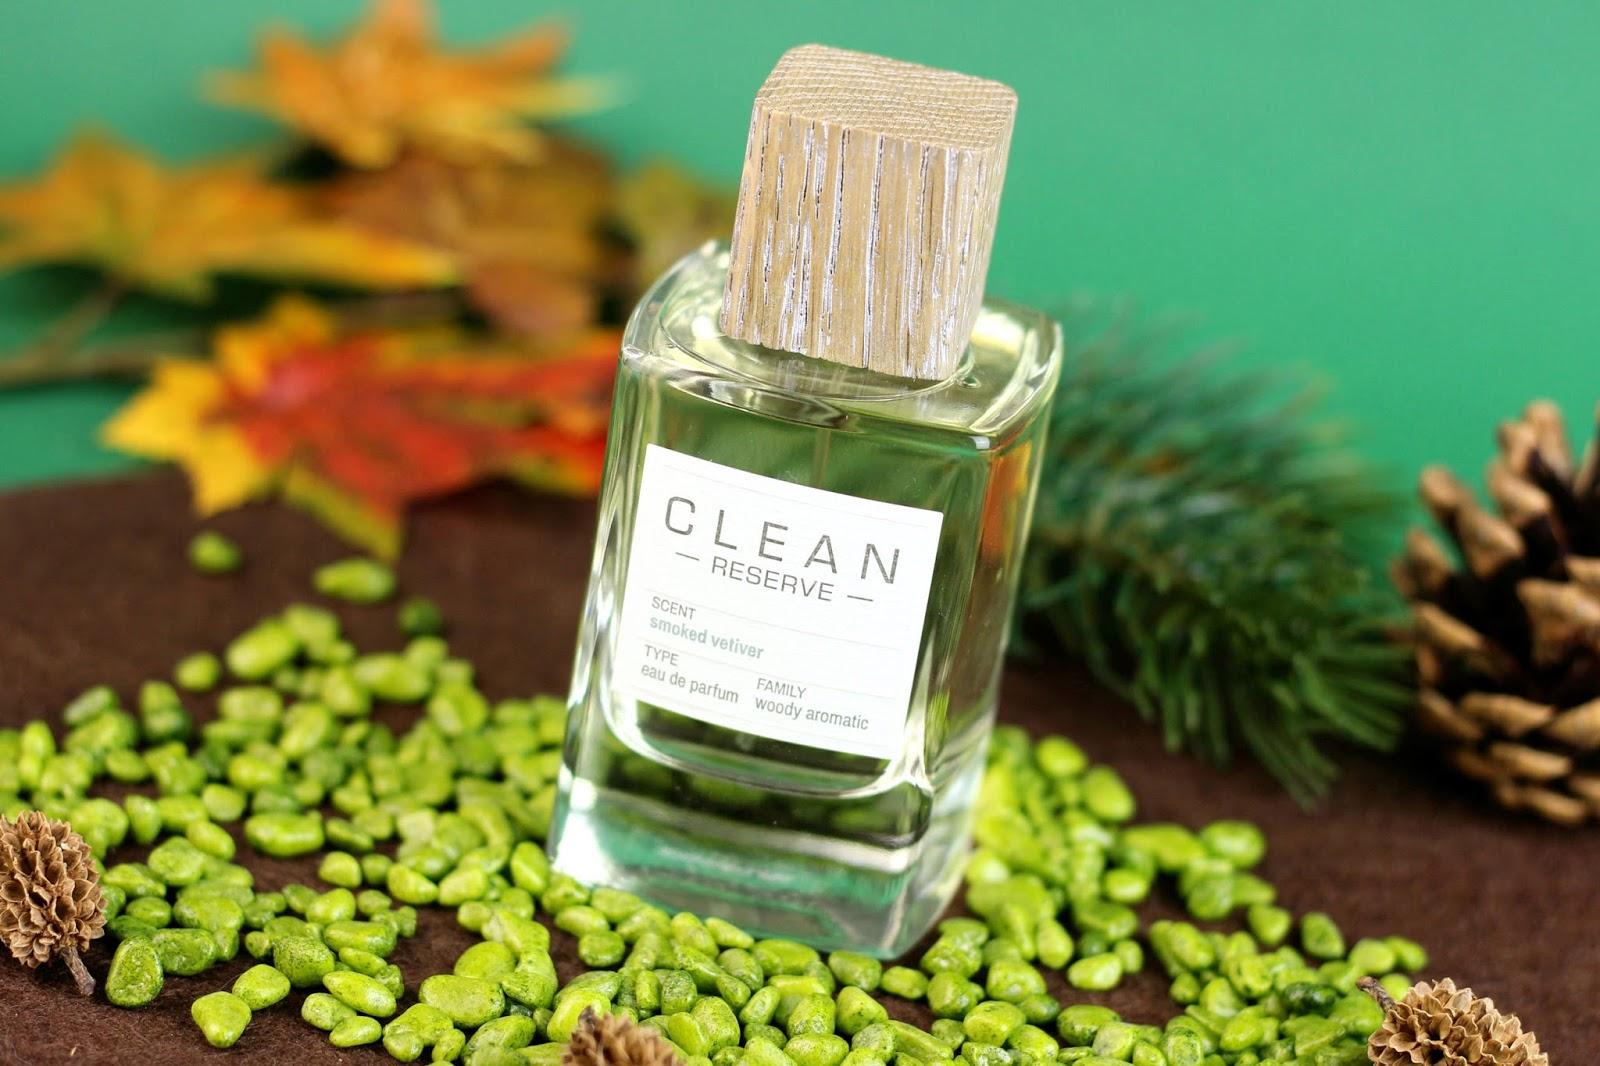 clean, reserve, smoked vetiver, eau de parfum, herrenduft, review, erfahrung, geschenkidee, duftbeschreibung, nachhaltig, holzig, aromatisch, männerduft, maskulin, damenduft, Clean Perfume, holzig-erdig,